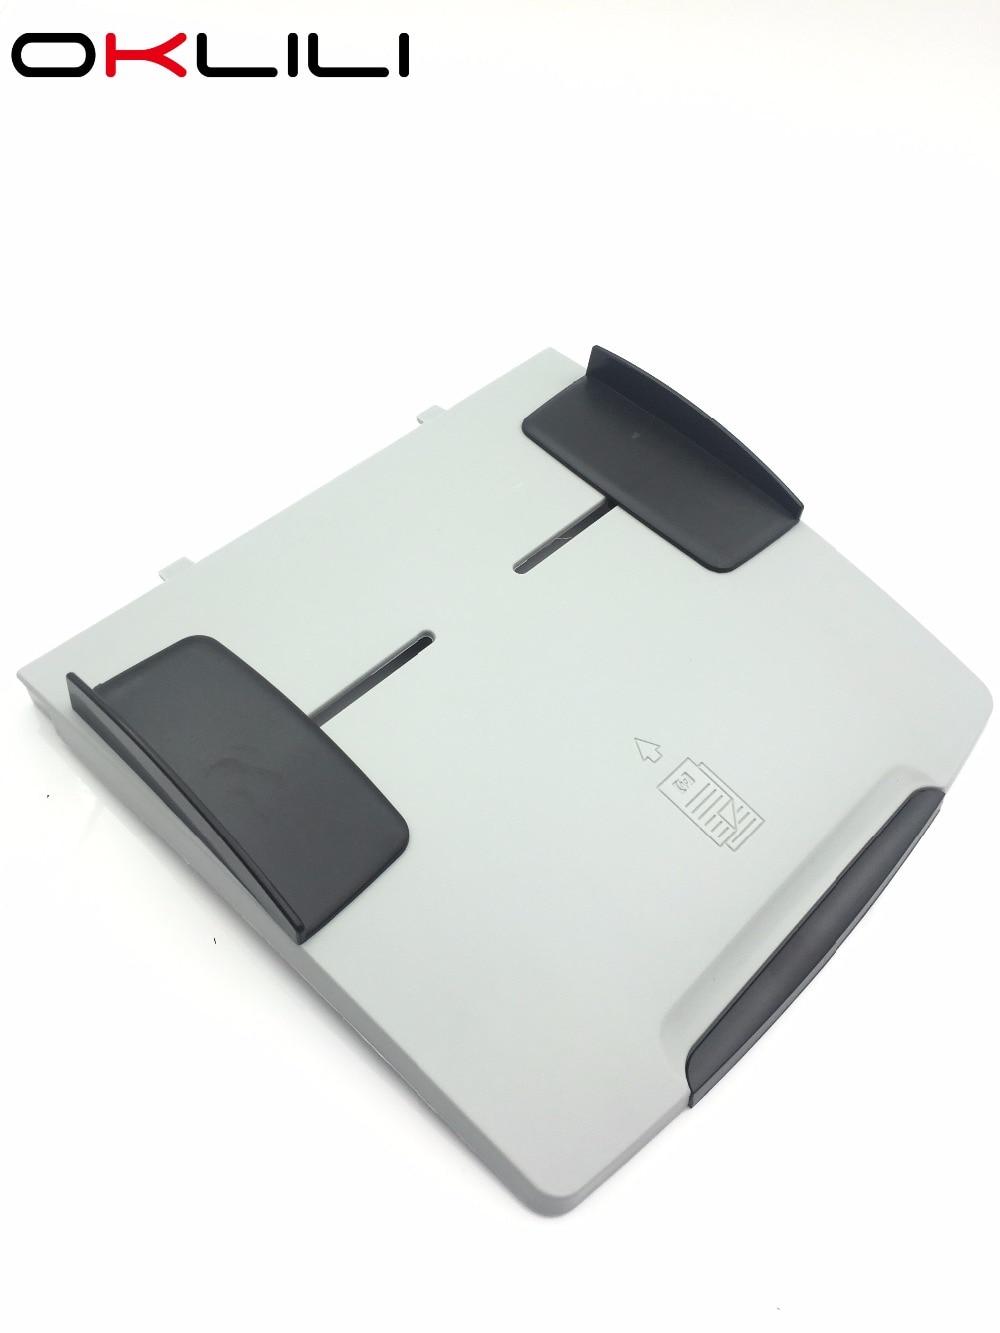 Q6500-60119 Q3948-60214 CB534-60112 ADF Paper Input Tray for HP 1522 CM1312 CM2320 3390 3392 M2727 2820 2840 3050 3052 3055 r97541w leaf style copper zircon finger ring silver